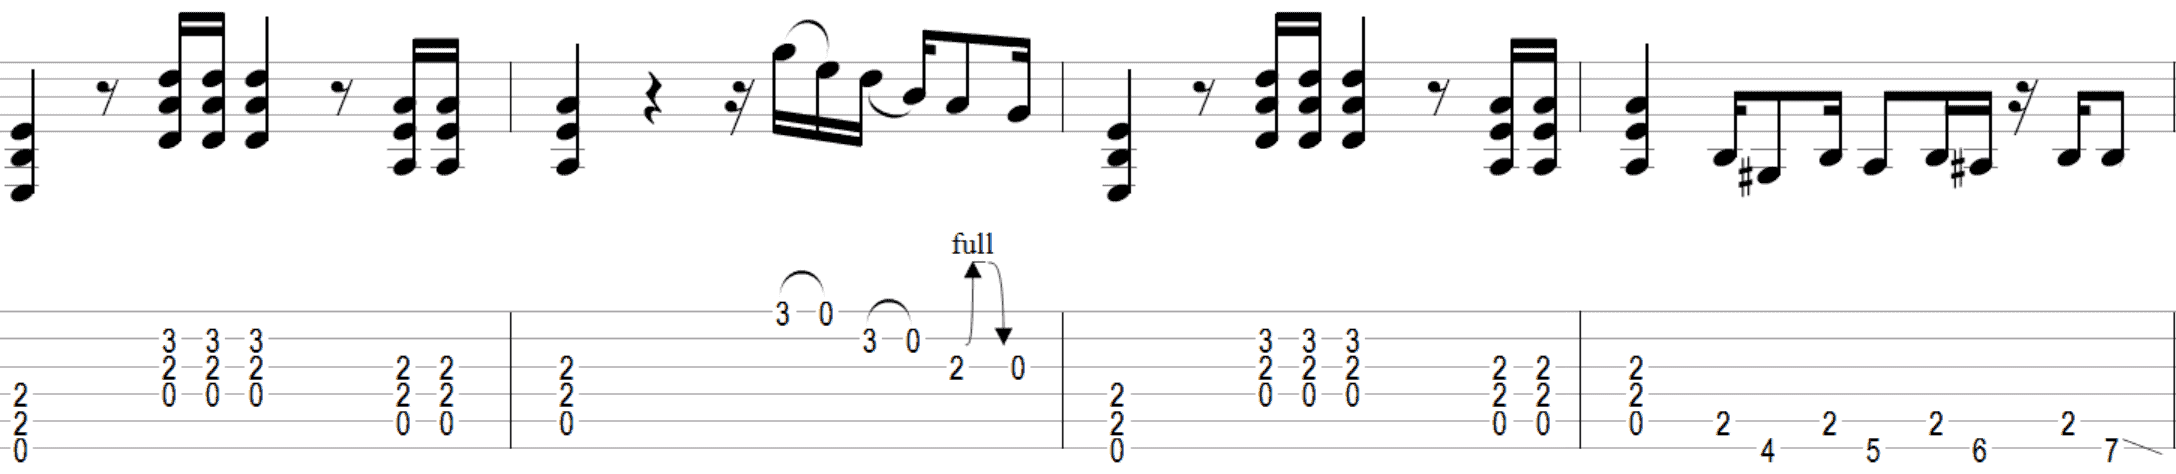 Riff guitare back in black bon riff jouer facile tablature débuter